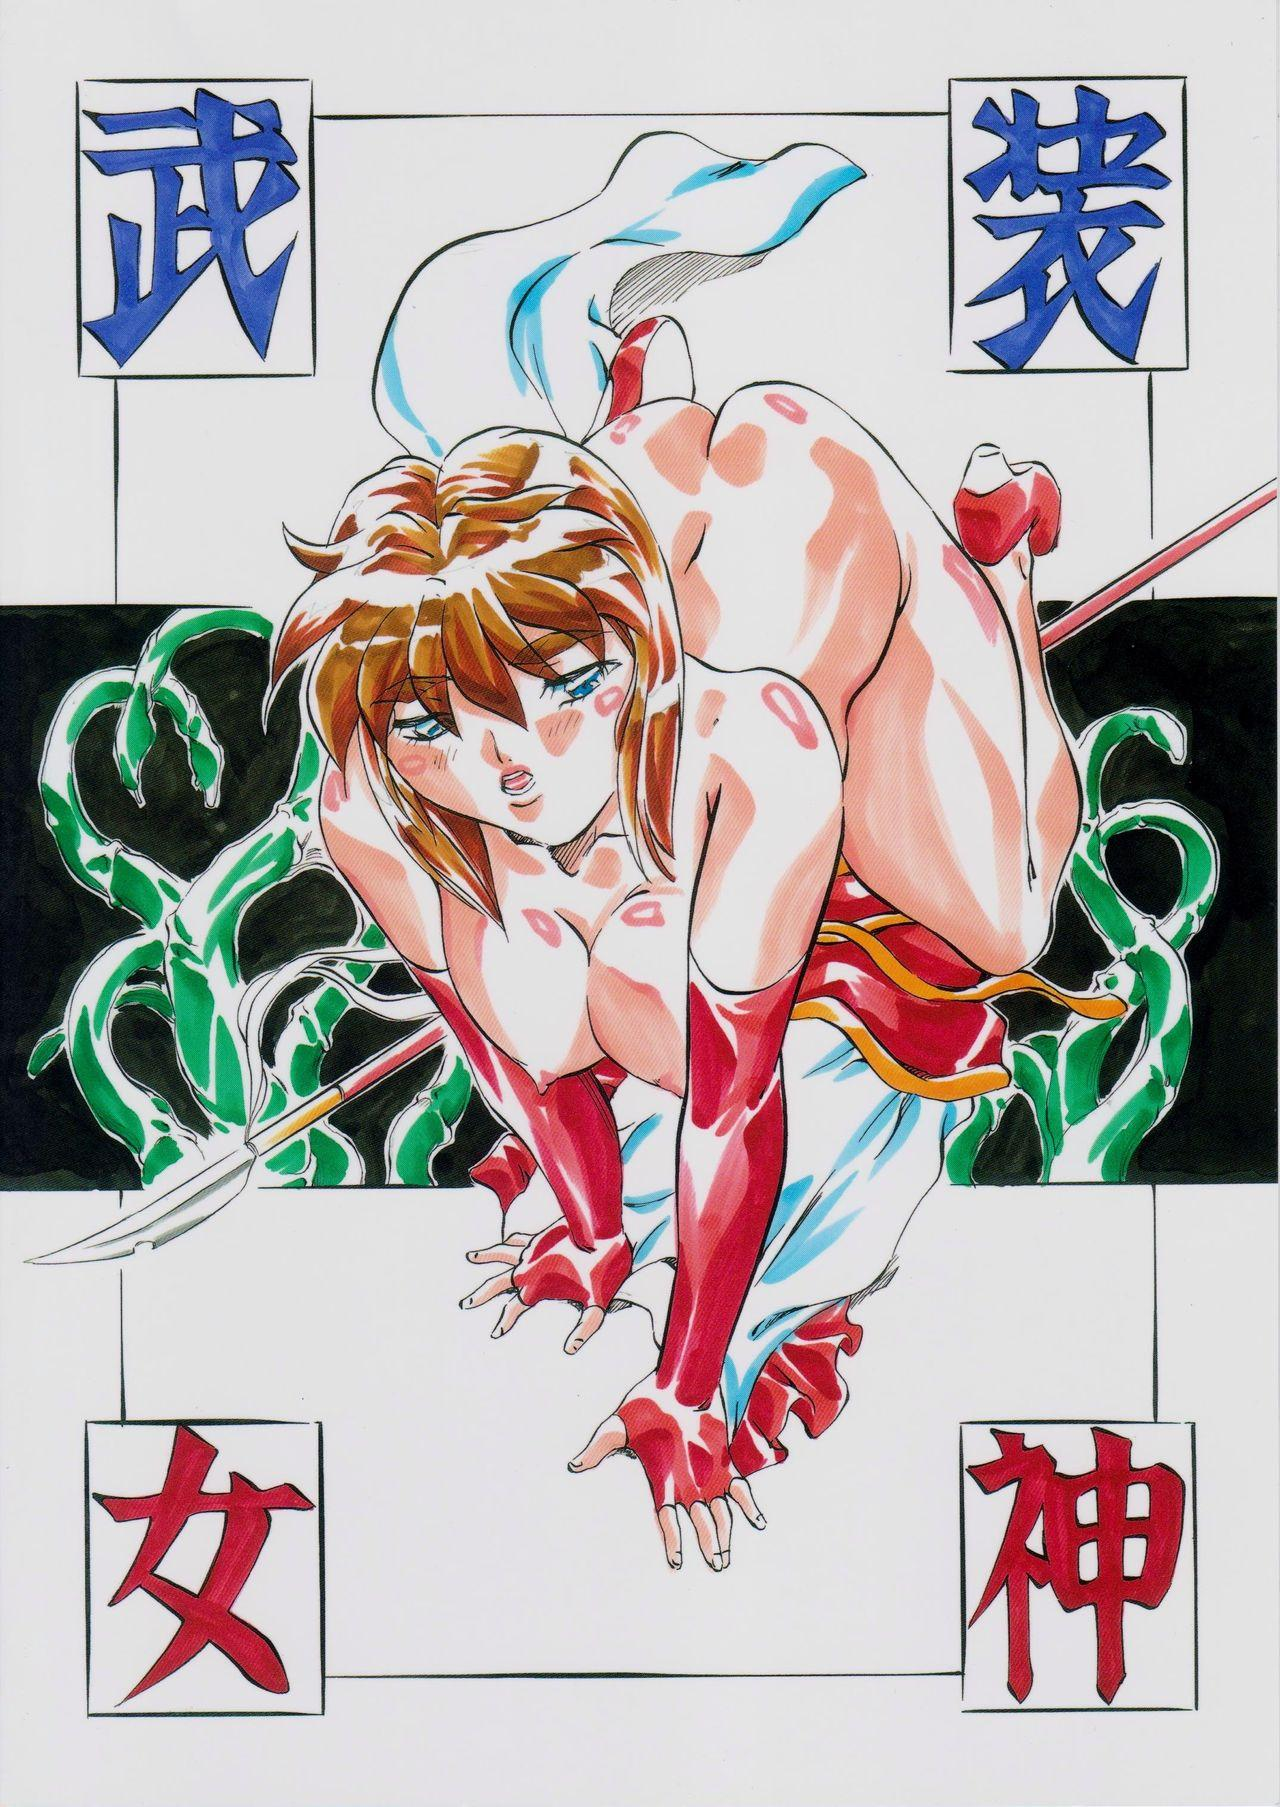 [Busou Megami (Kannaduki Kanna)] 亜衣&麻衣 ~女喰花~ II (Injuu Seisen Twin Angels) 22